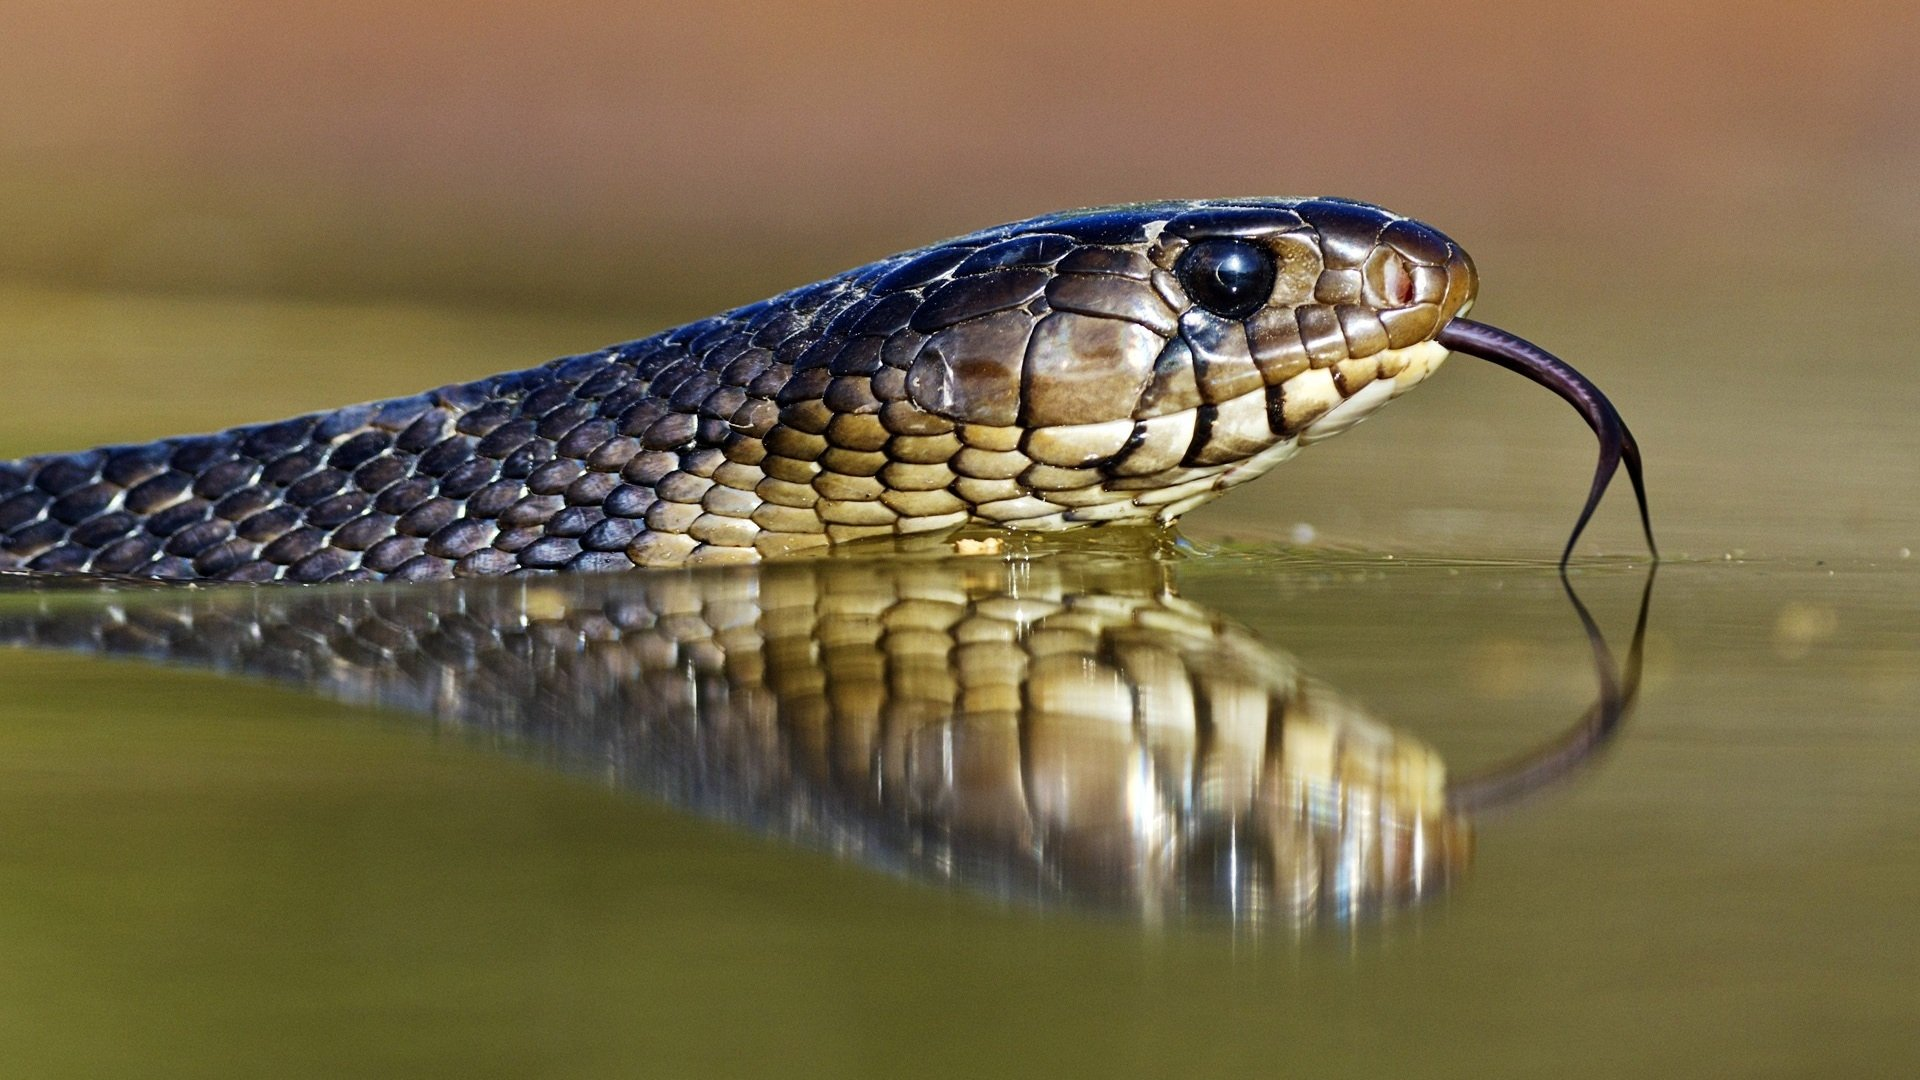 snake hd wallpaper background image 1920x1080 id 391746